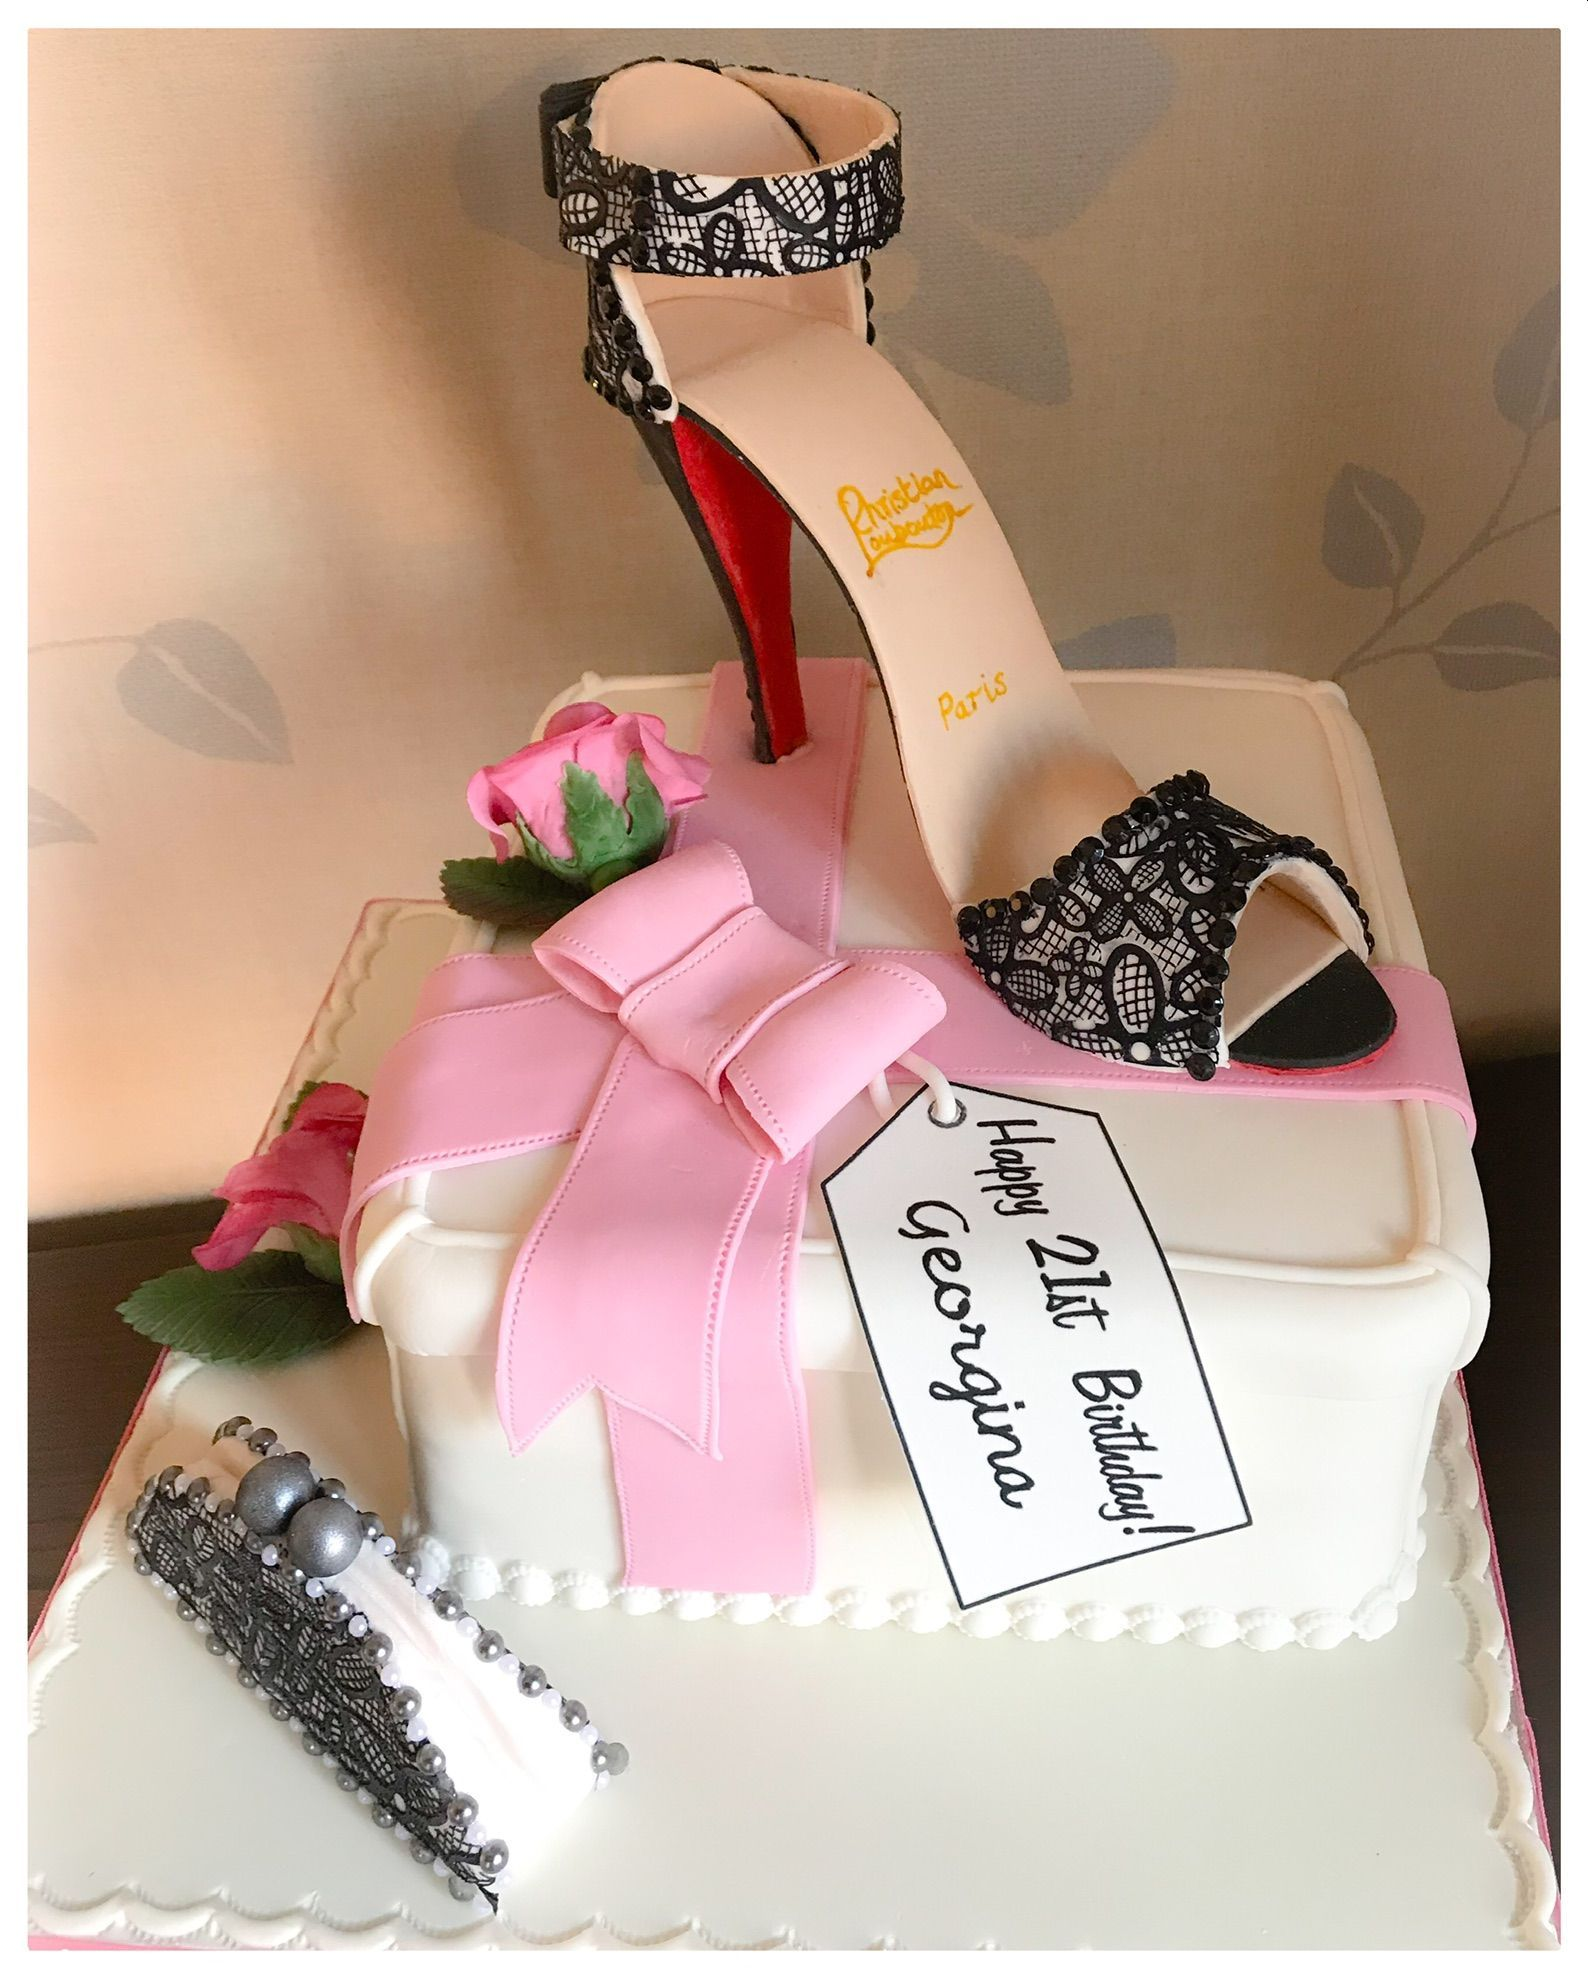 louiboutin 21st cake 2